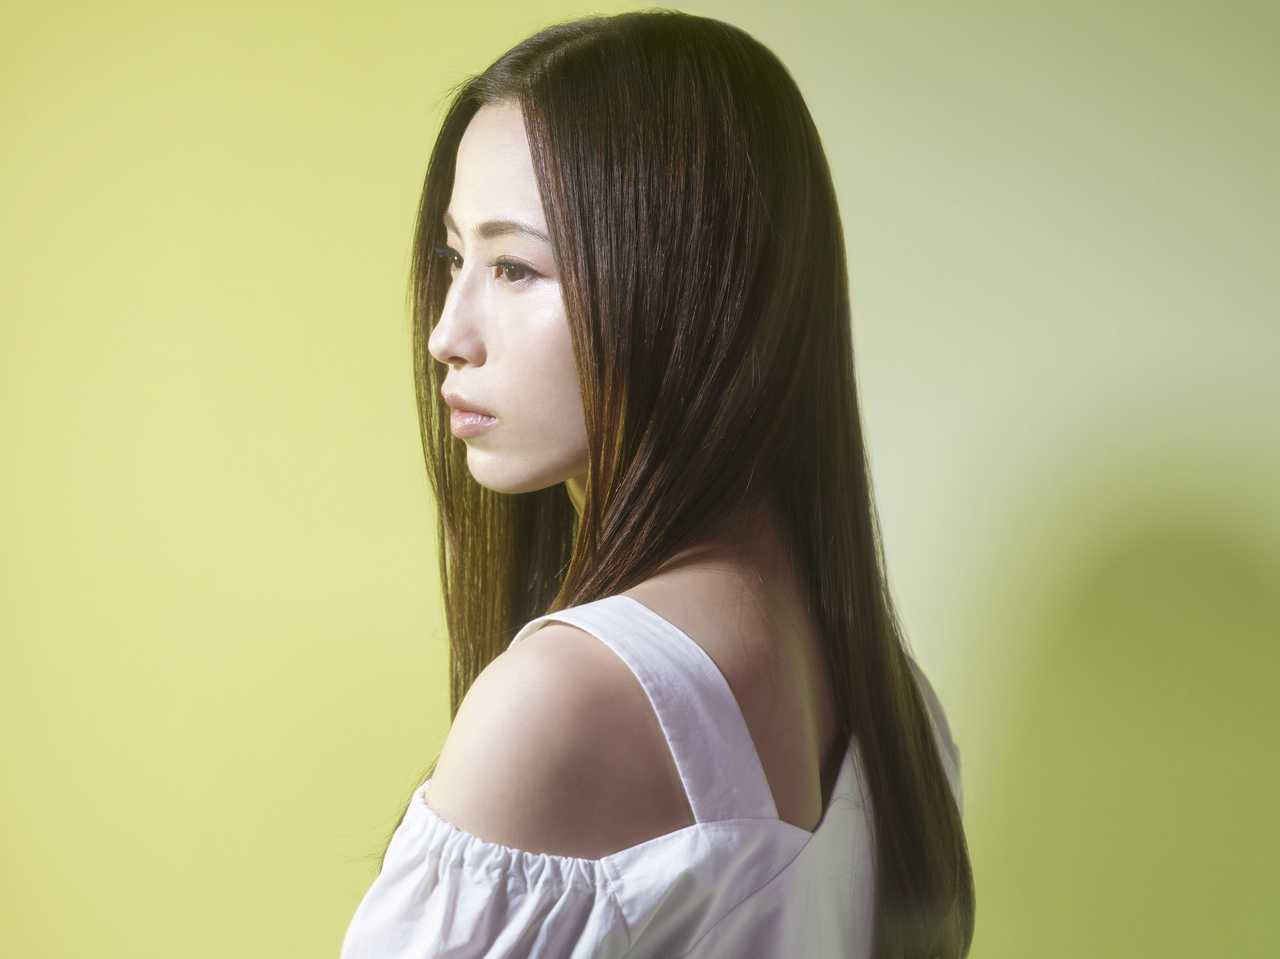 Uru デビュー以前からの夢の場所・東京国際フォーラムで11月13日に単独公演の開催が公開!